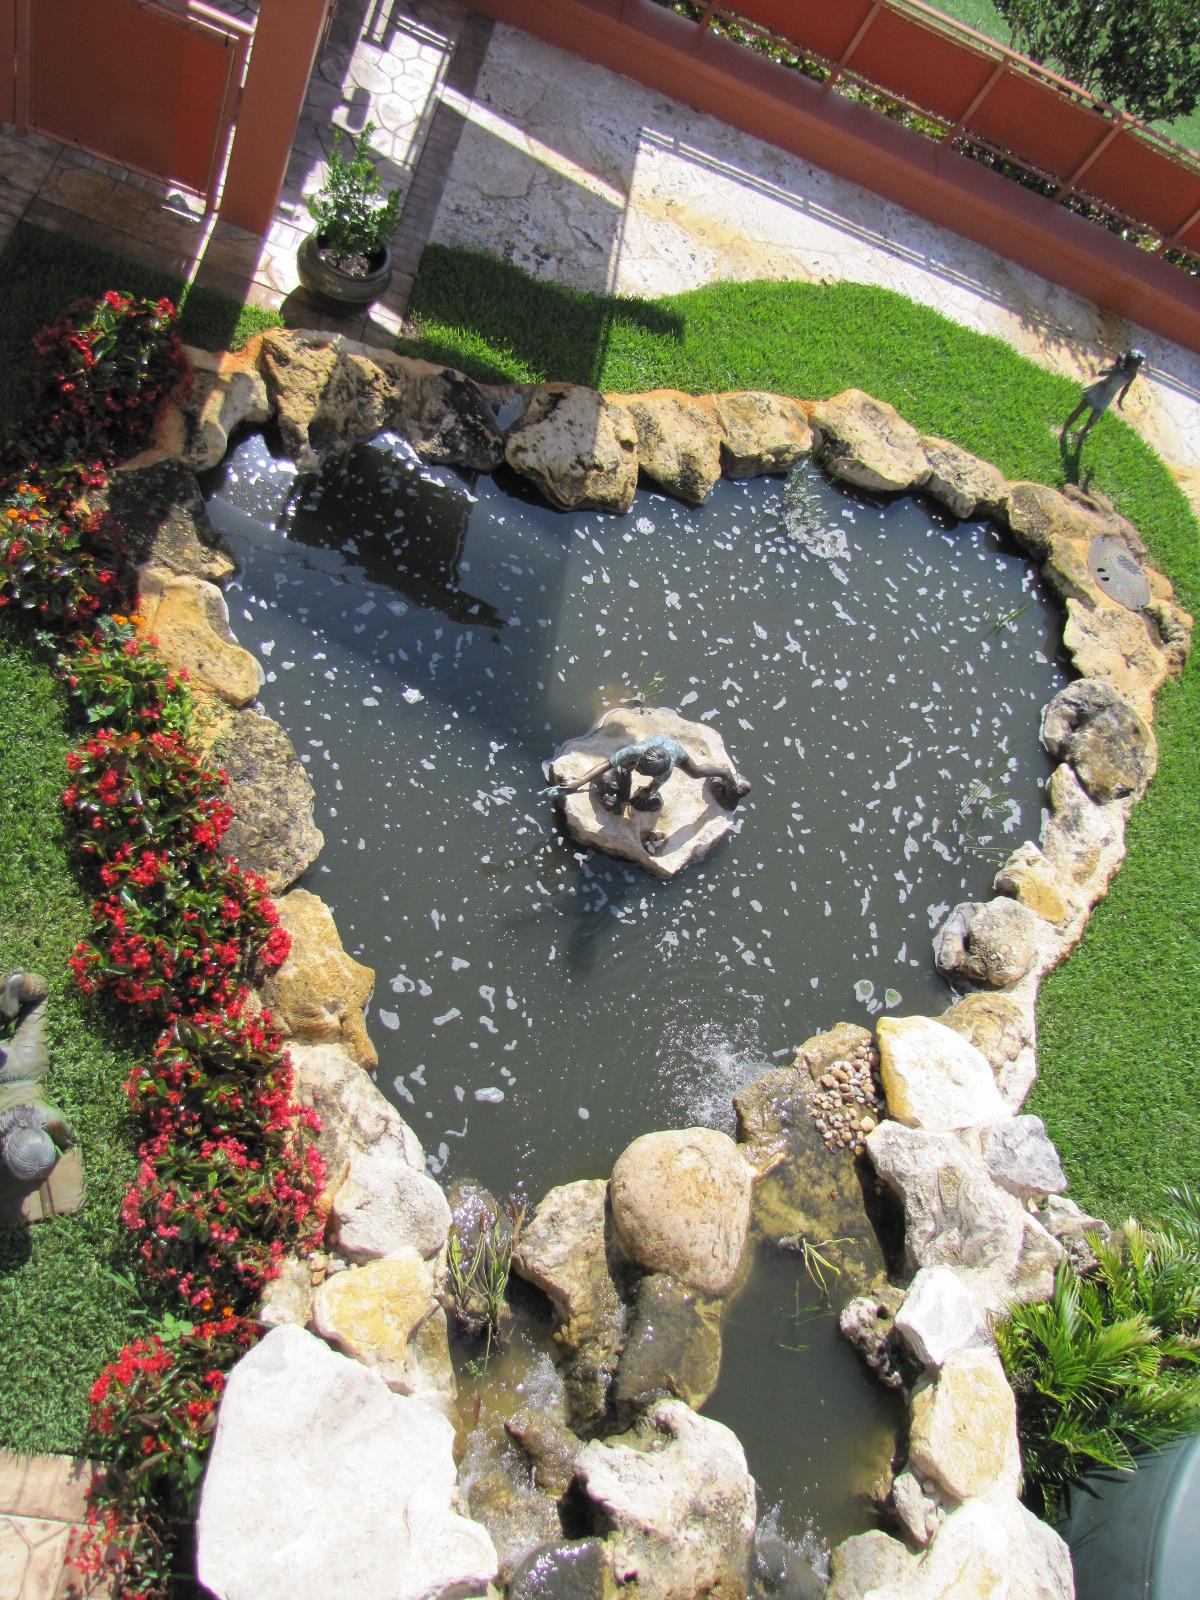 turtle river montessori collected rainwater pond  bronze sculpture.jpg